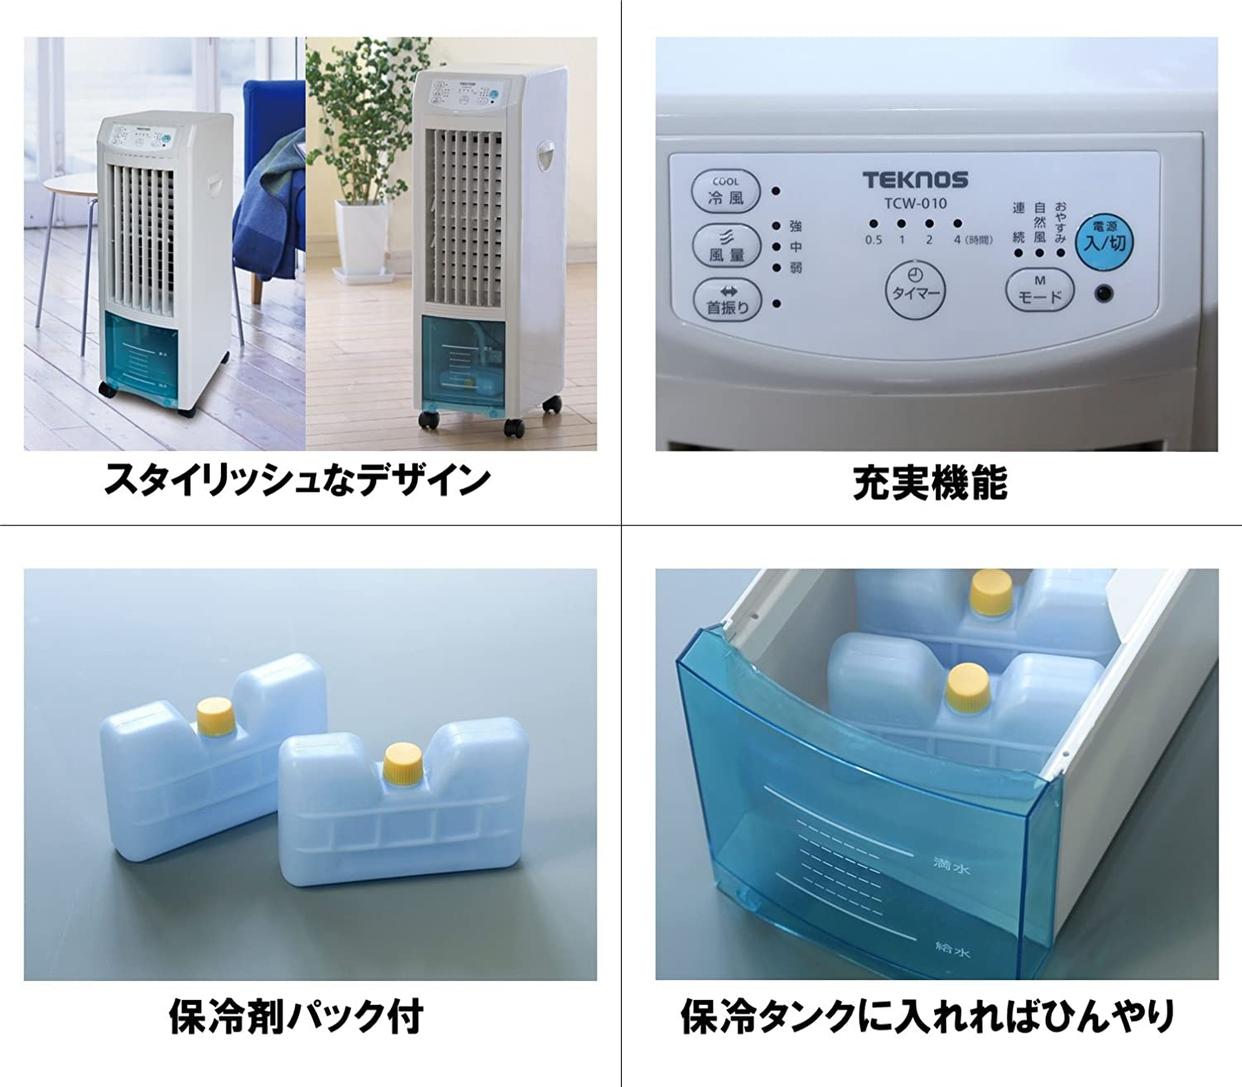 TEKNOS(テクノス) リモコン冷風扇風機 TCW-010の商品画像3